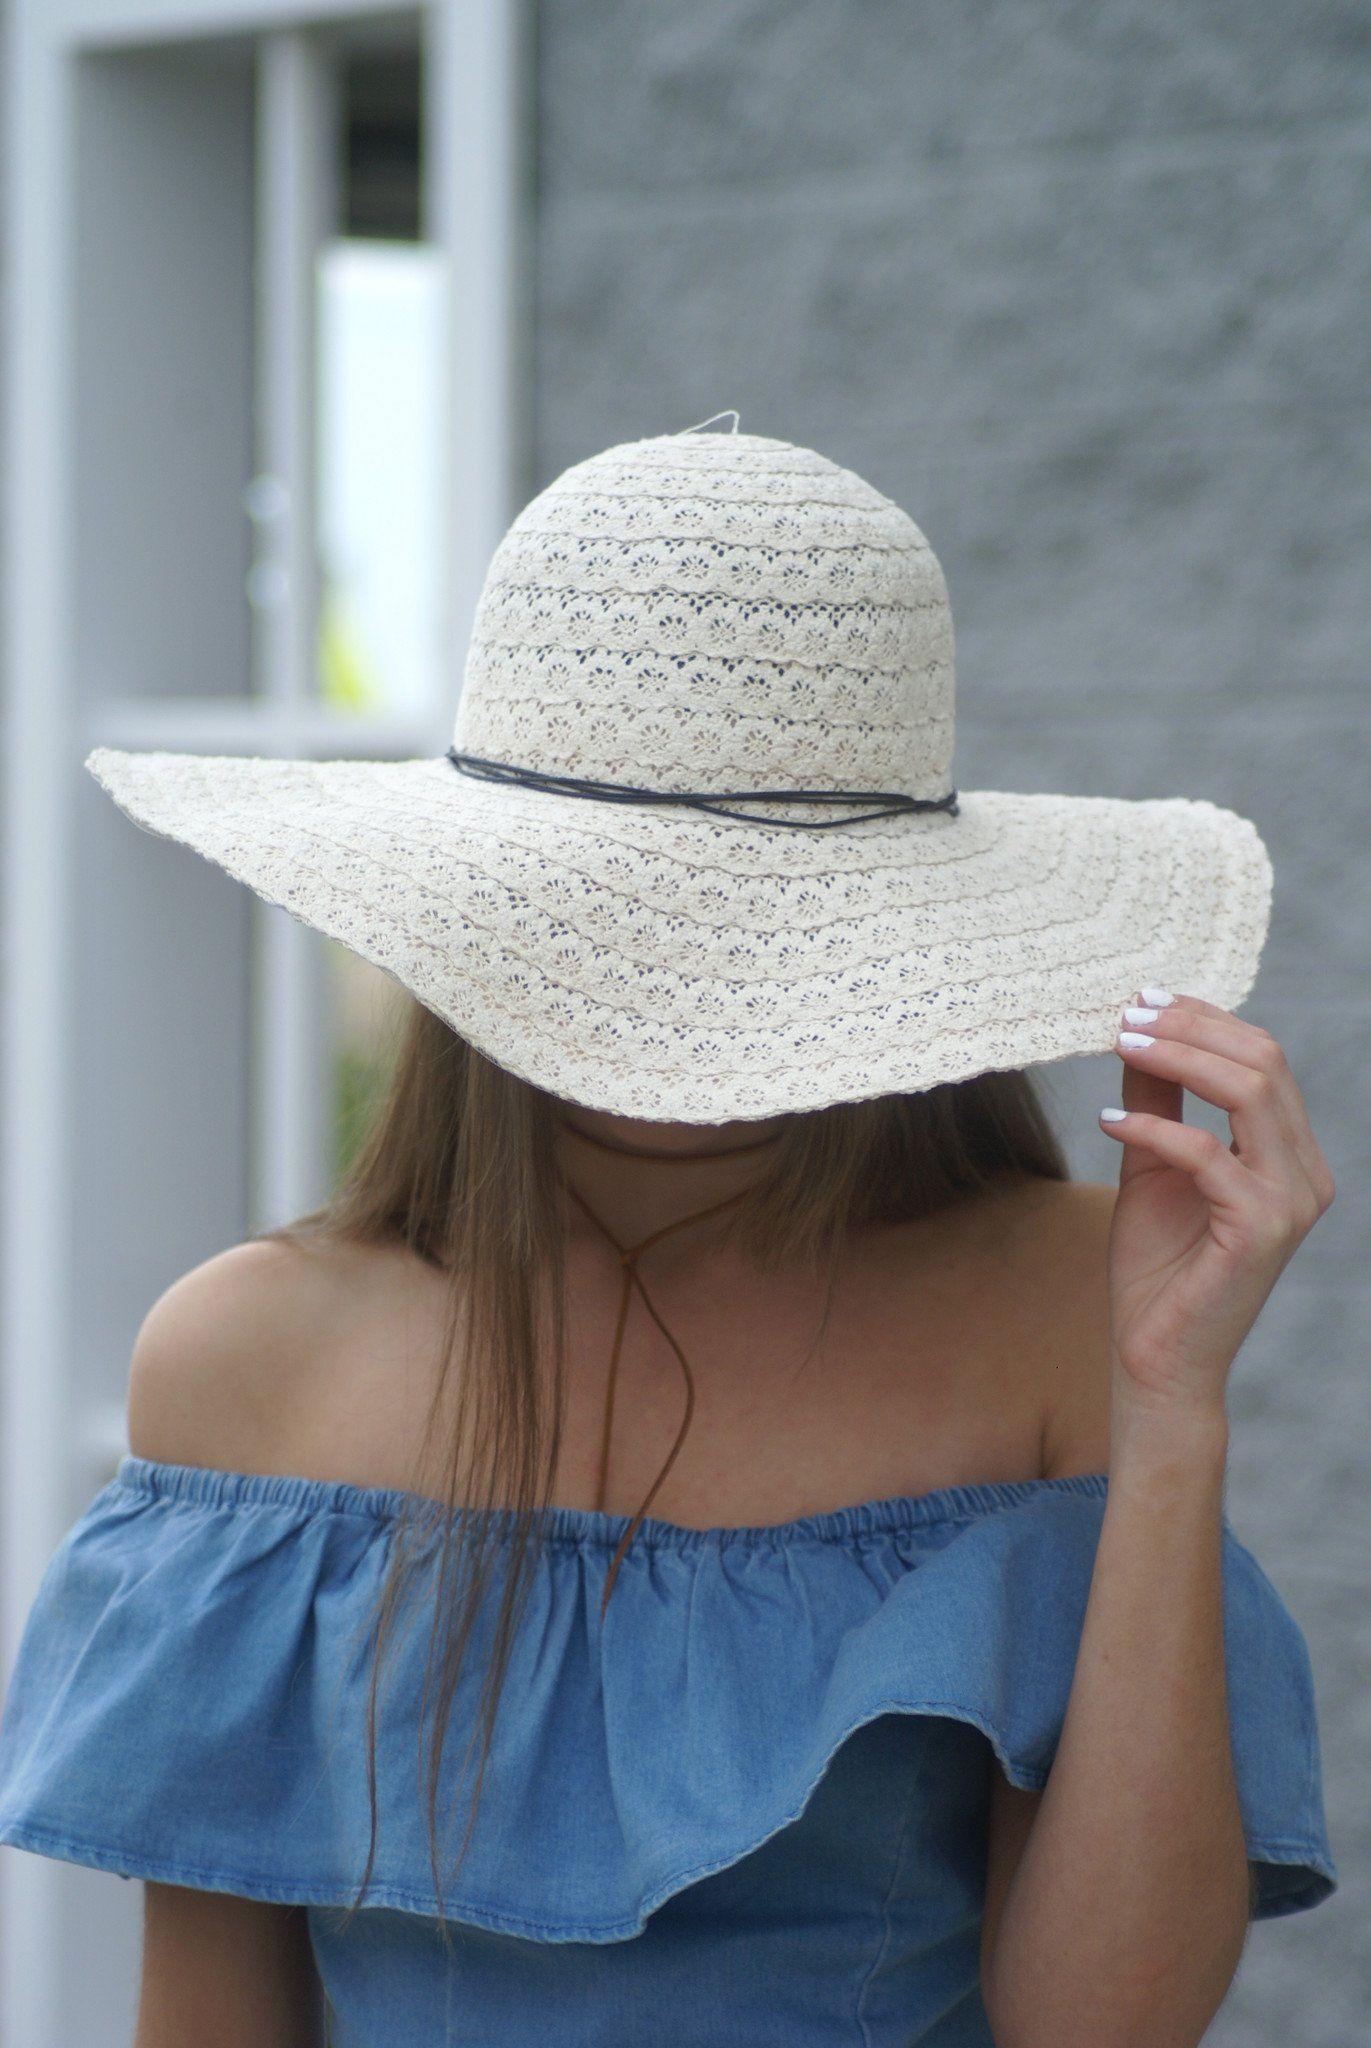 fd5ae5b5 Crochet Floppy Beach Hat in 2019 | Fashion | Hats, Cute hats, Sun hats